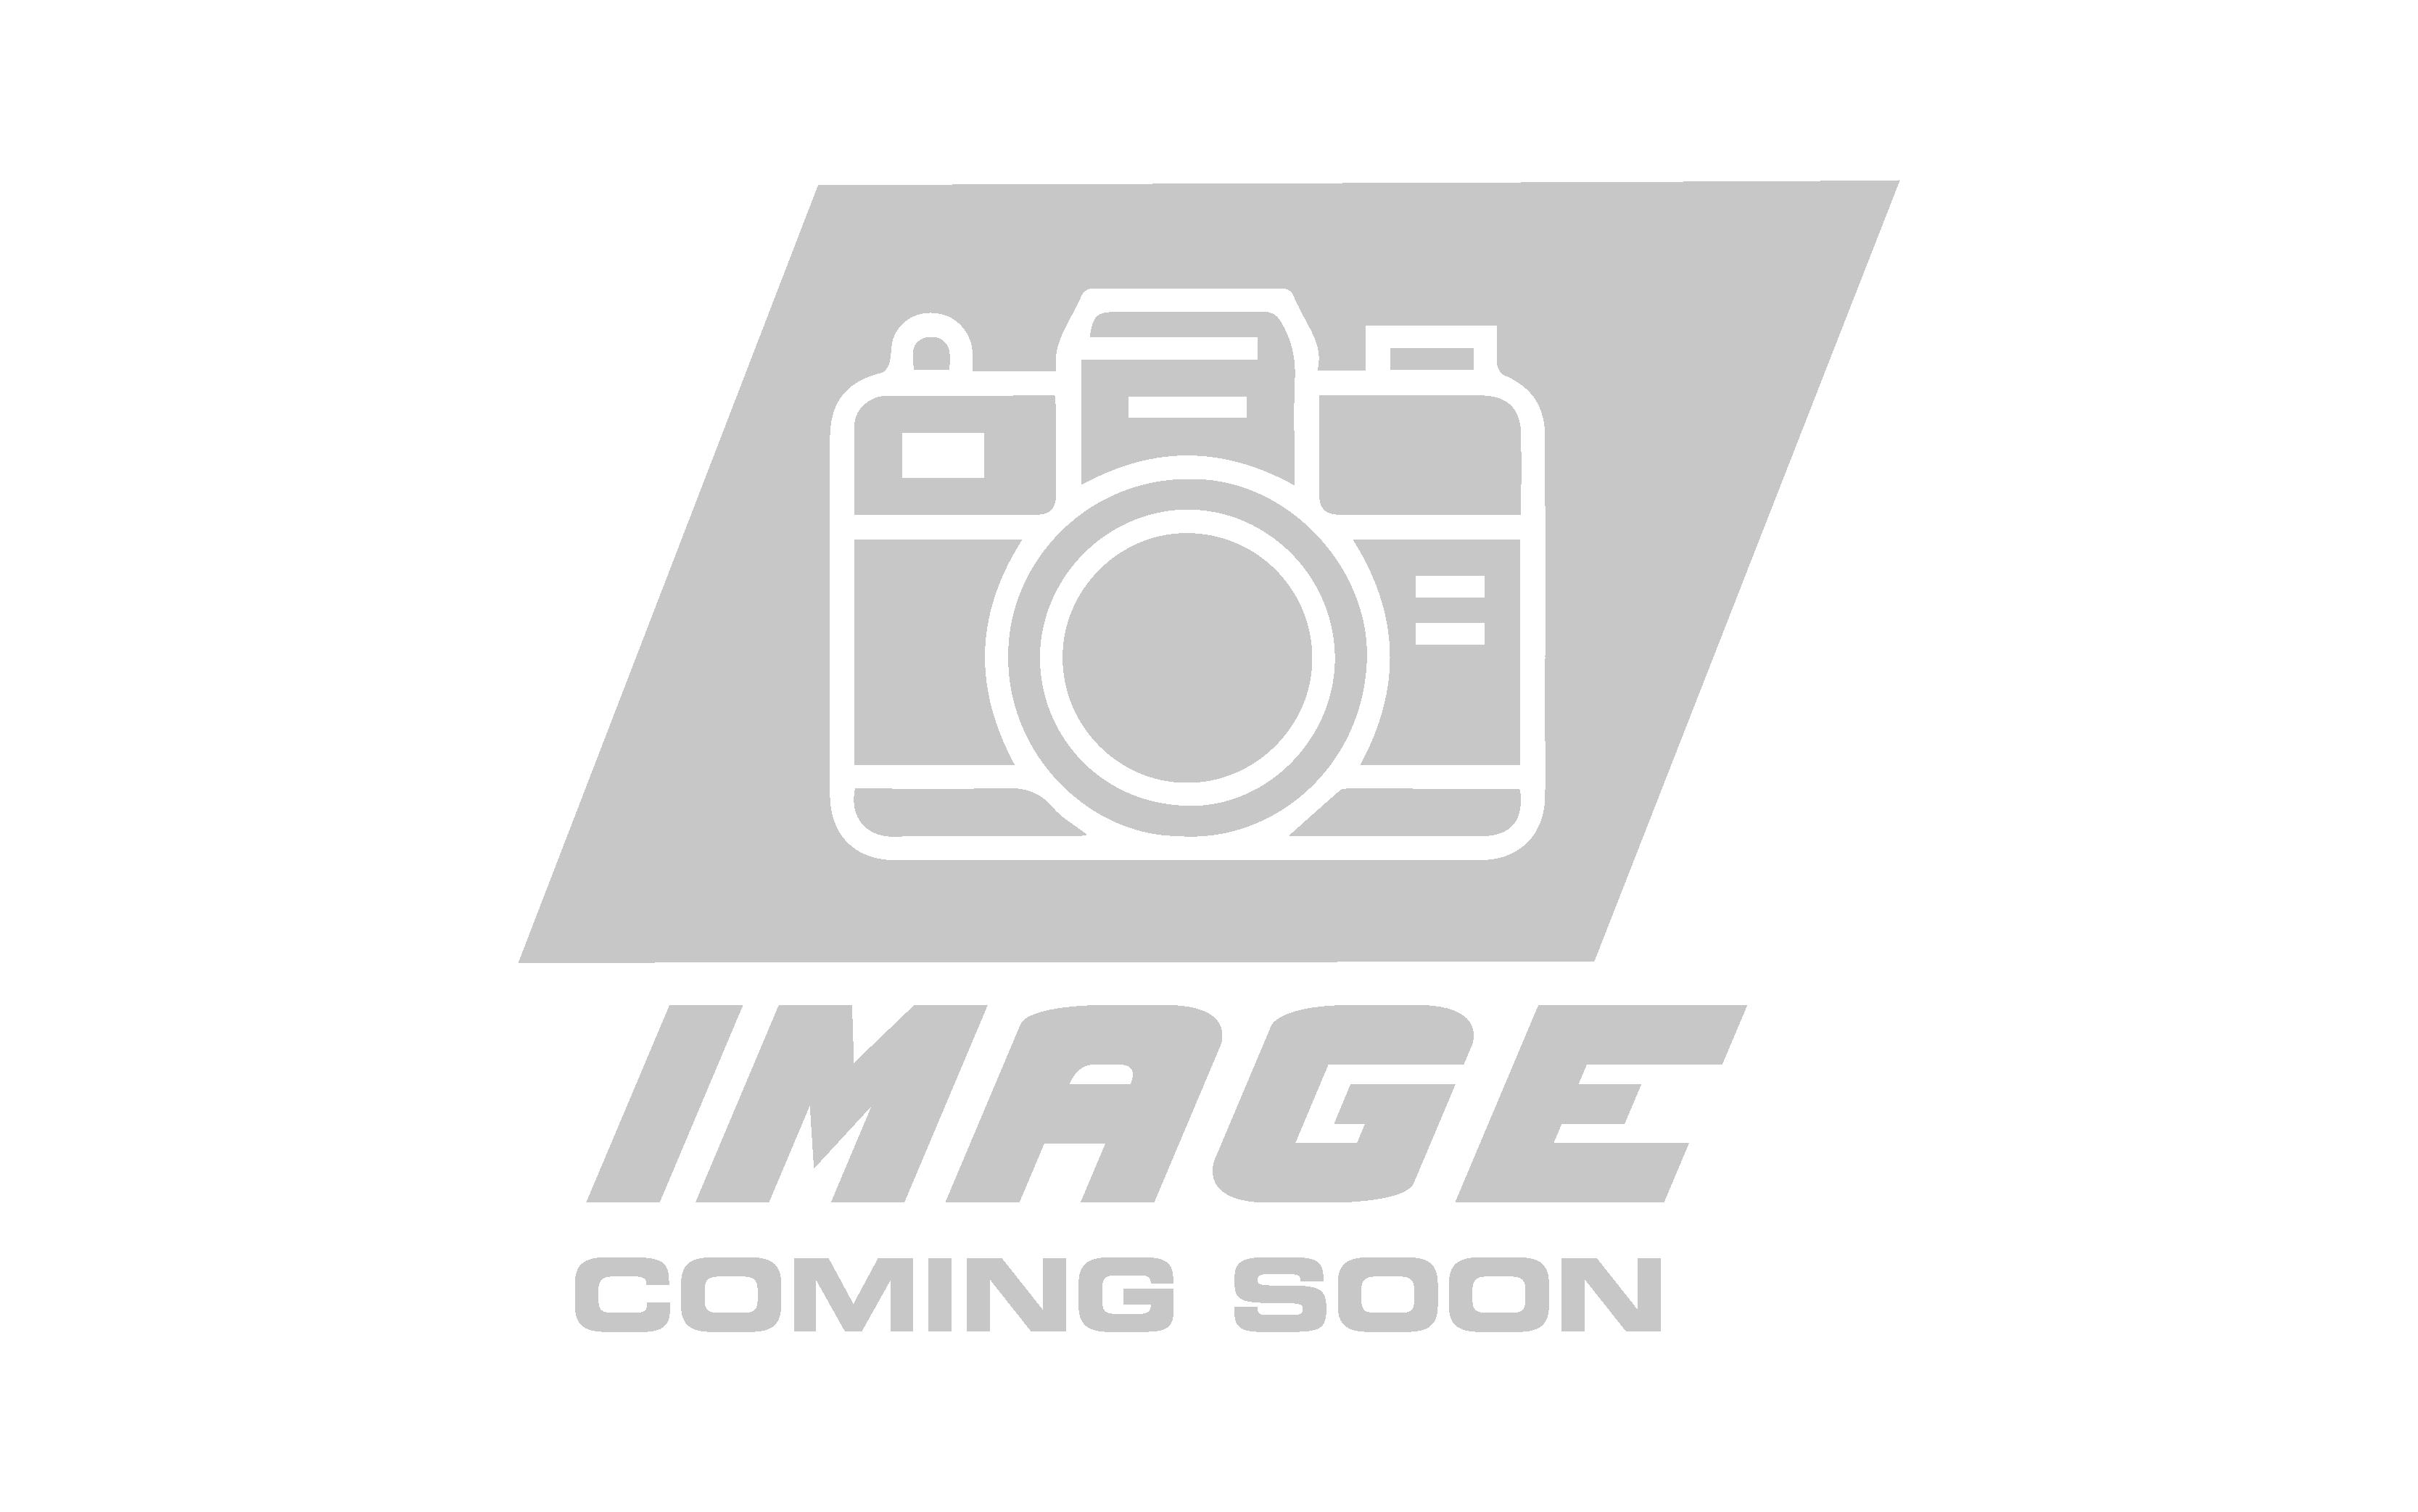 subaru_wrx_sti_va_air_lift_performance_sleeve_style_bag_1